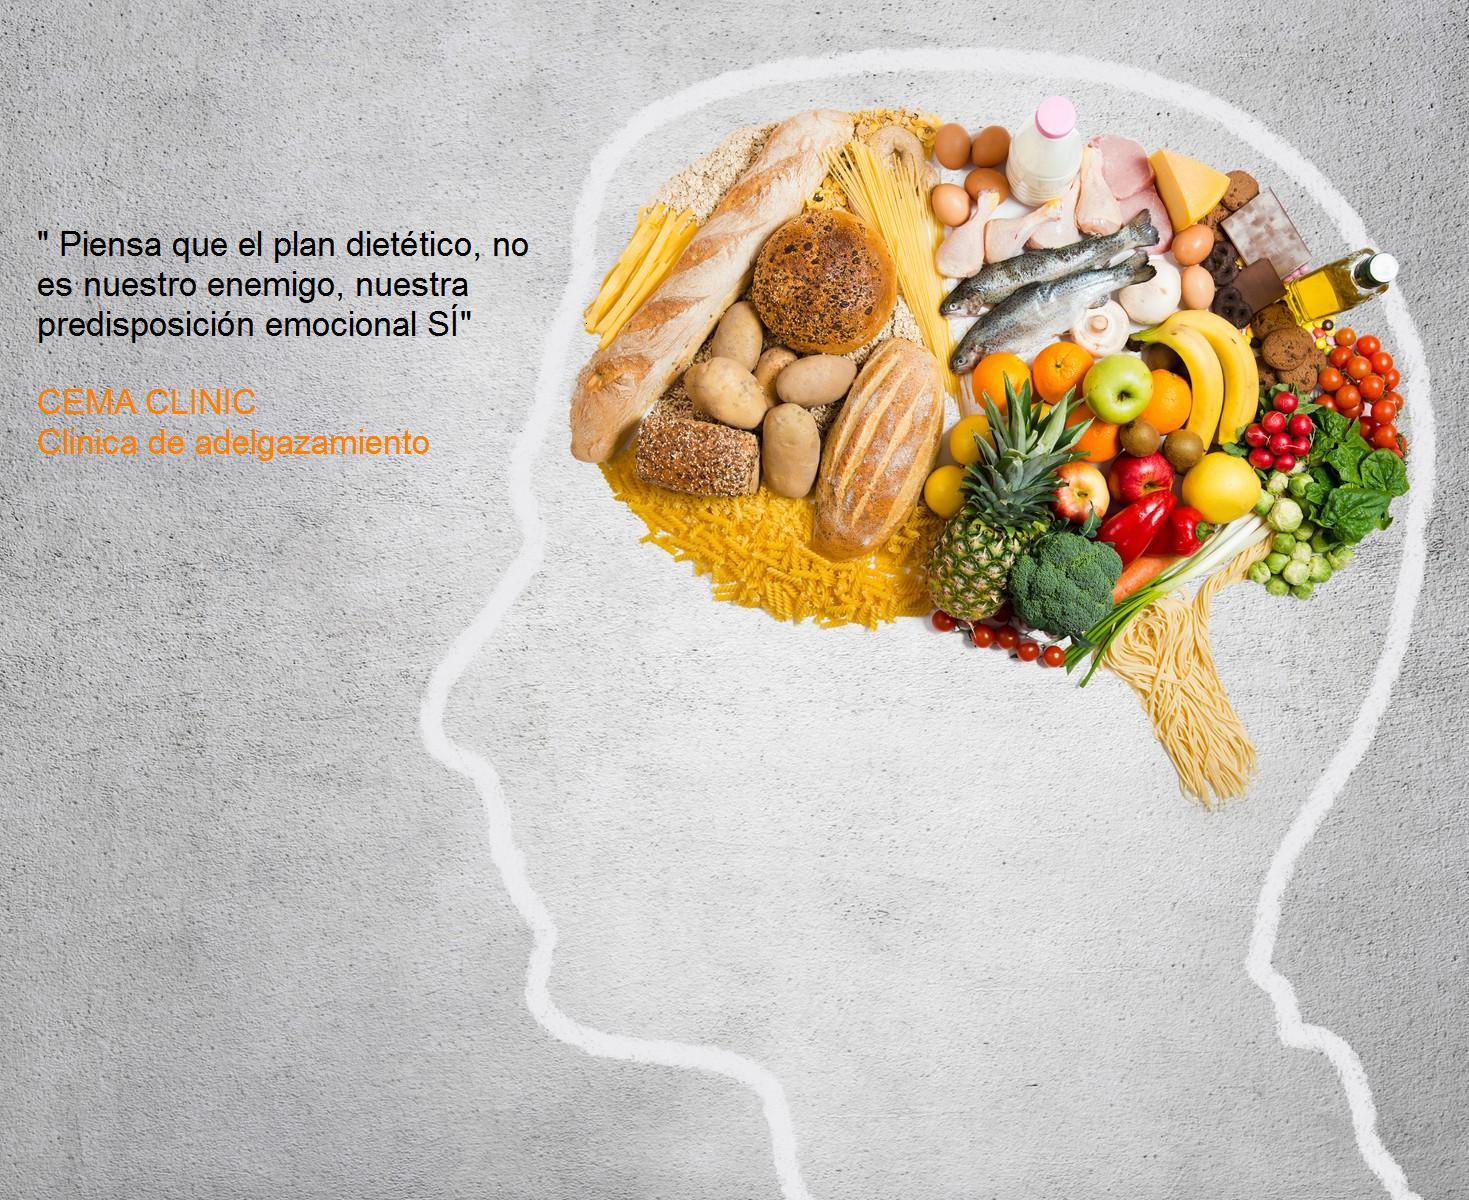 dietista nutricionista en barcelona , plan dietético